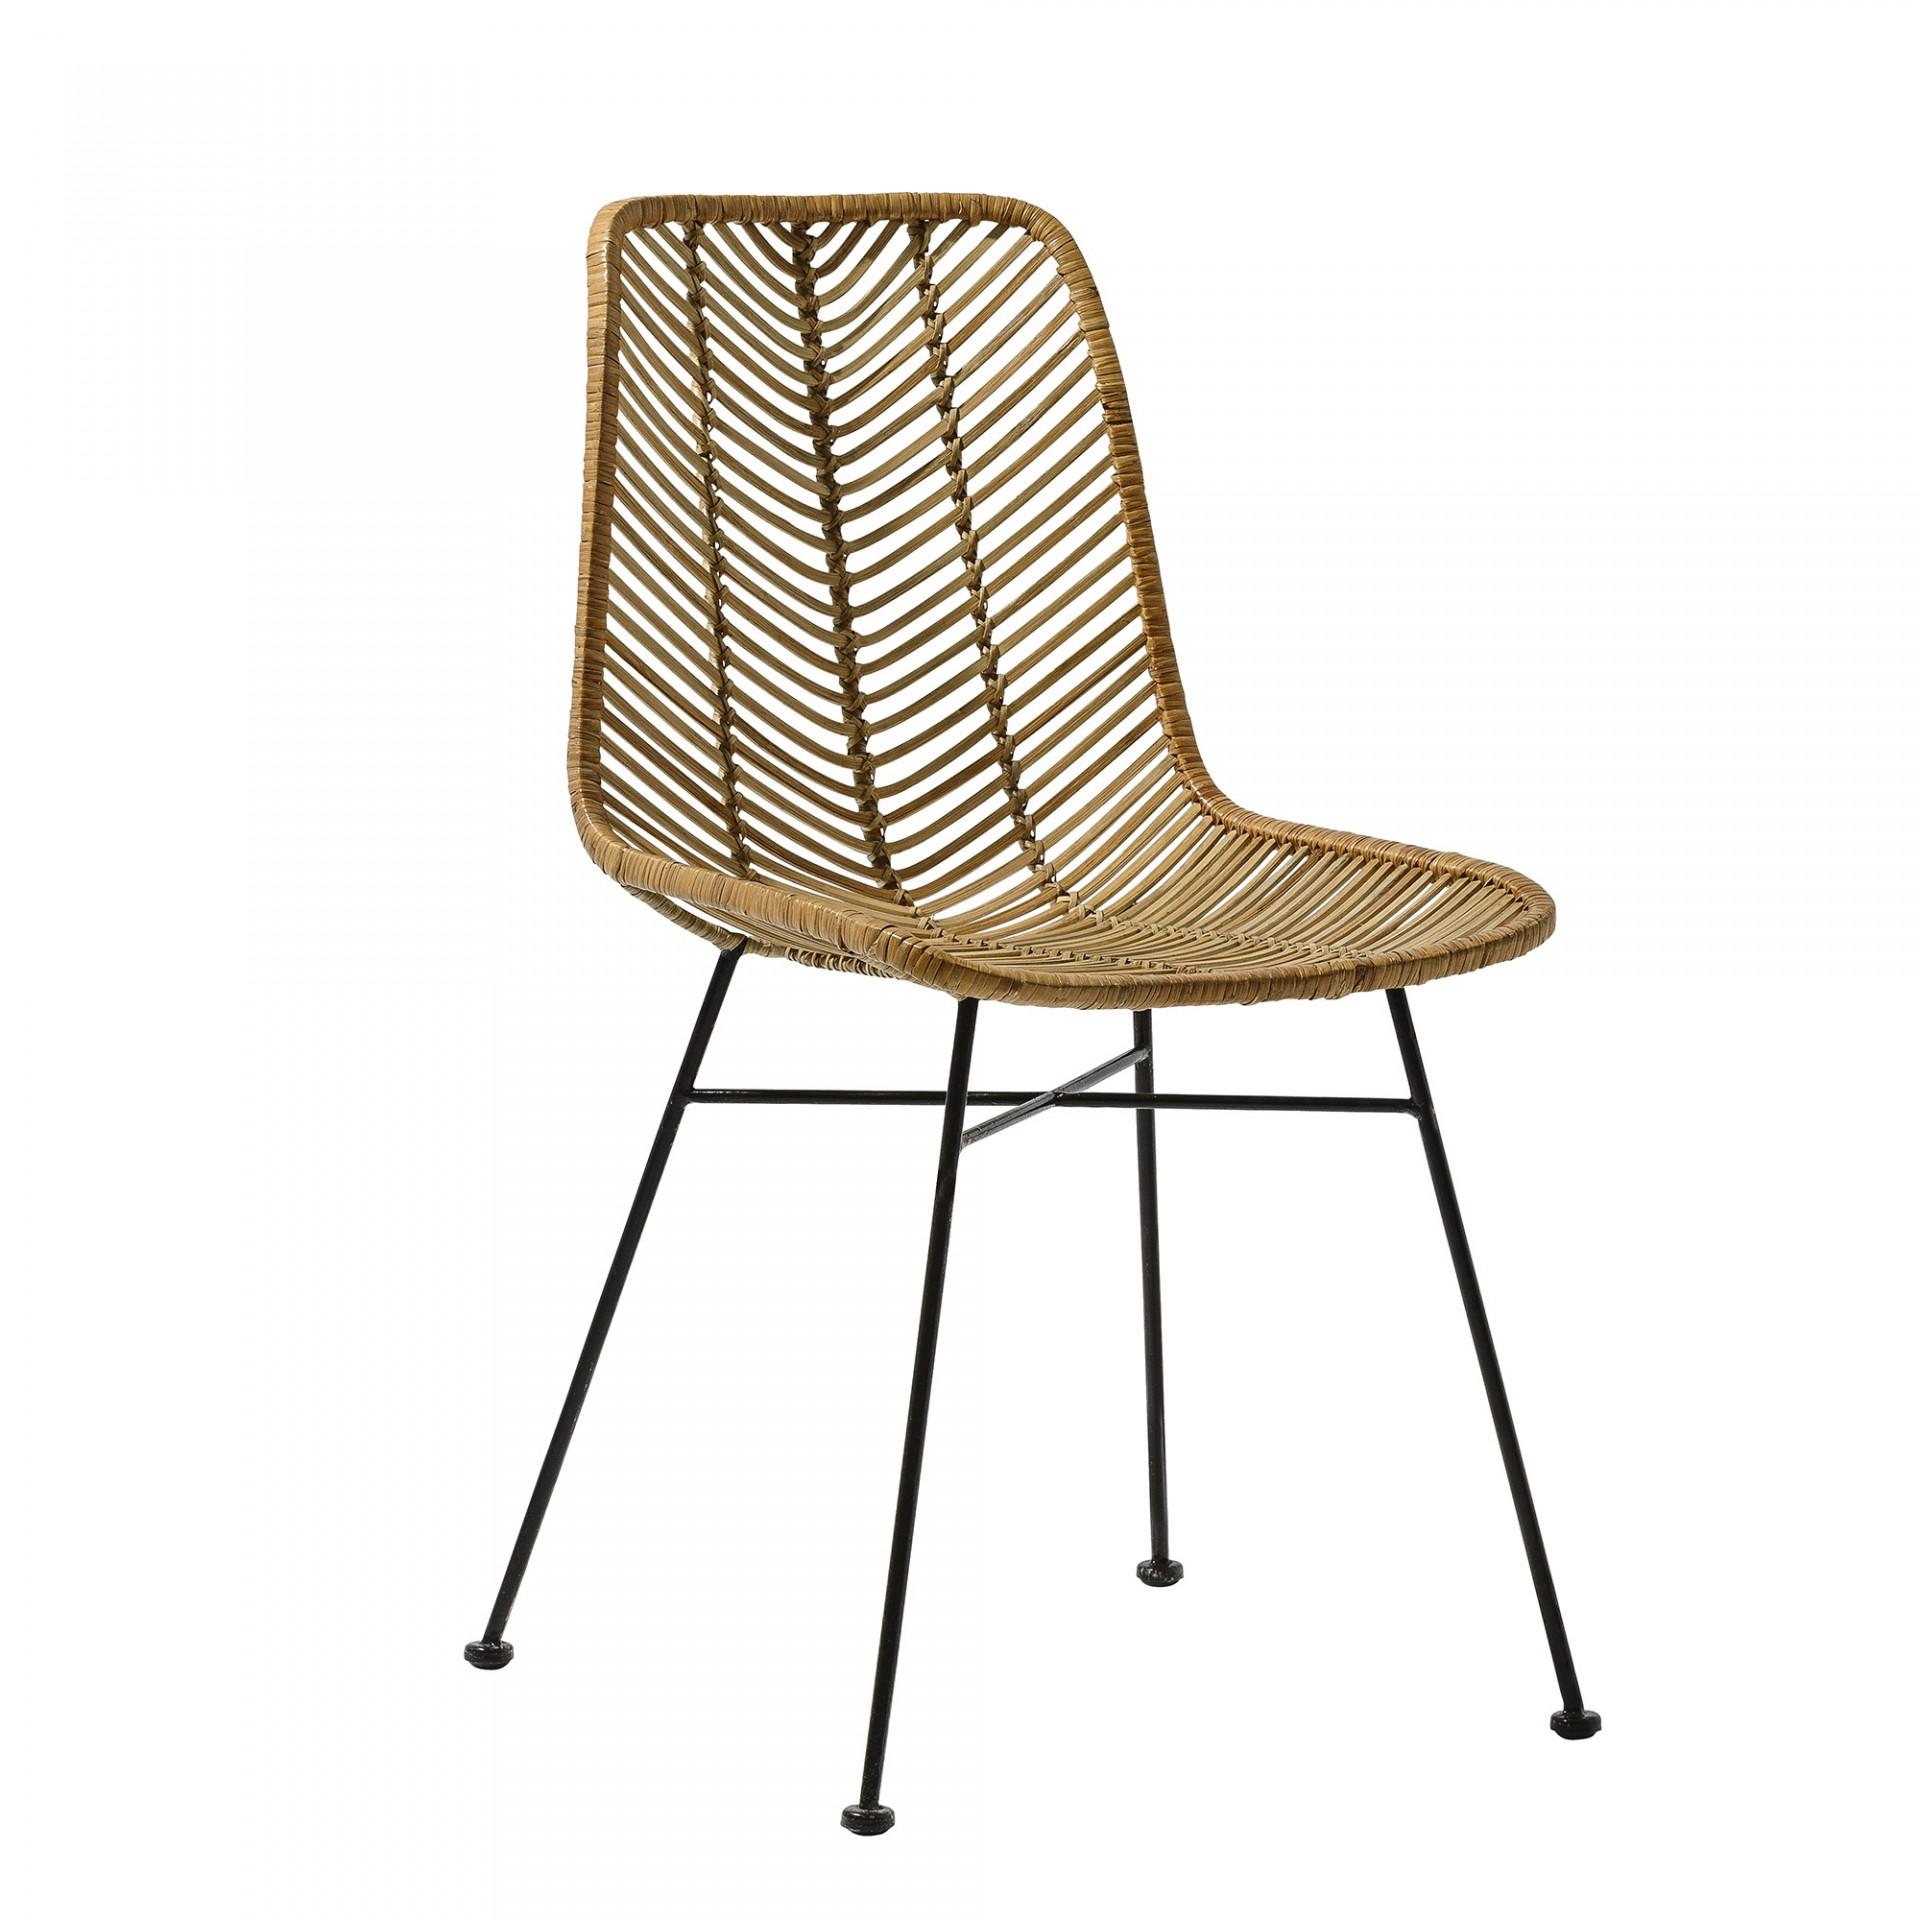 Cadeira Lena, rattan natural